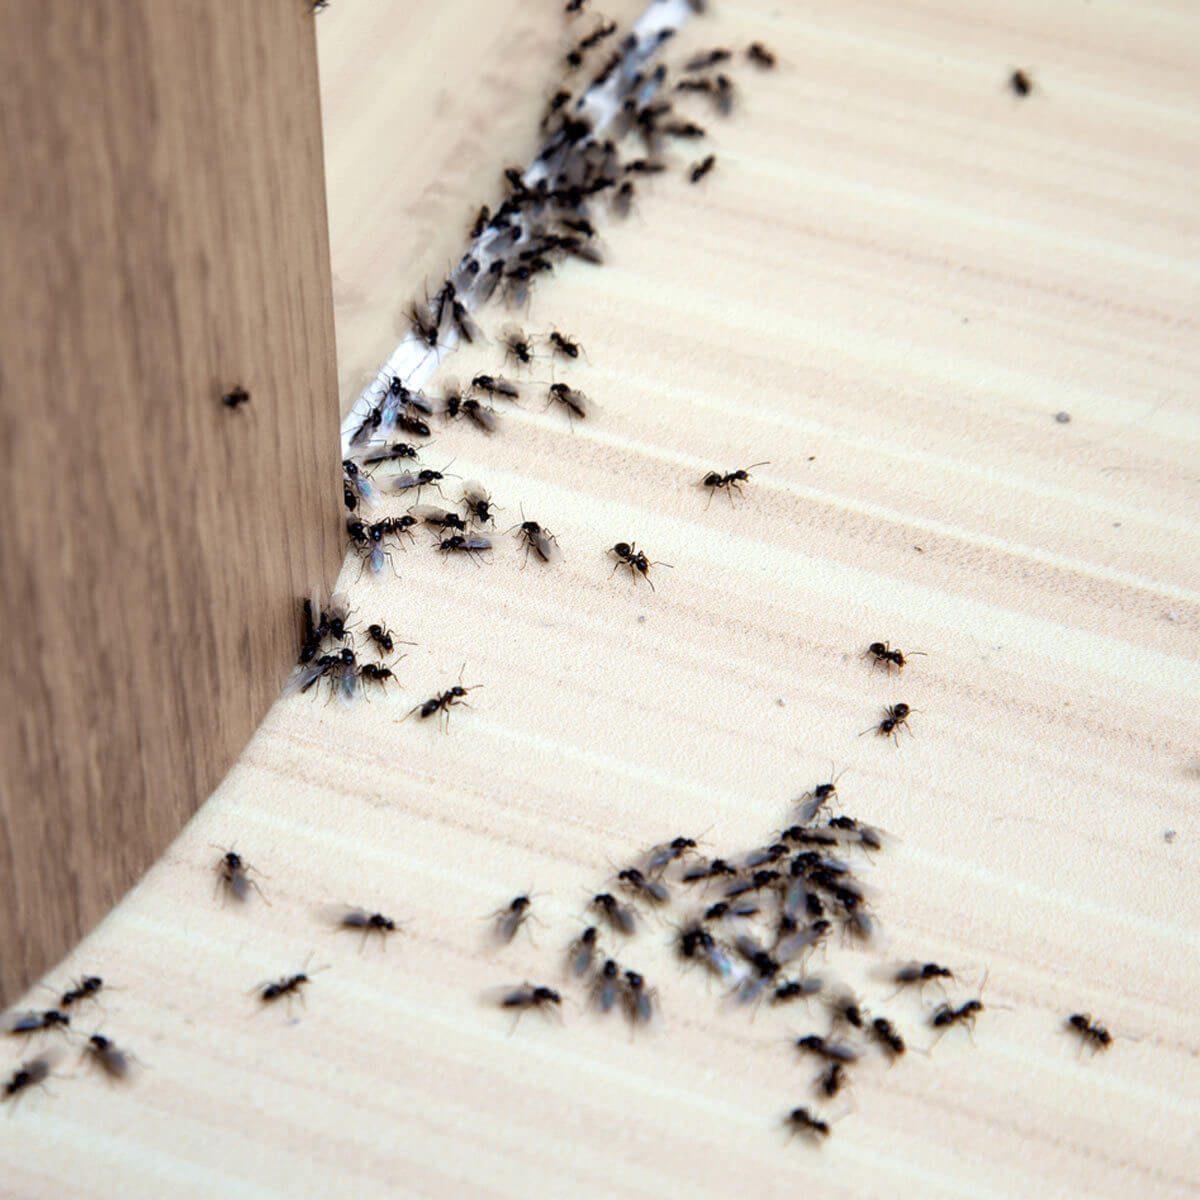 ants inside